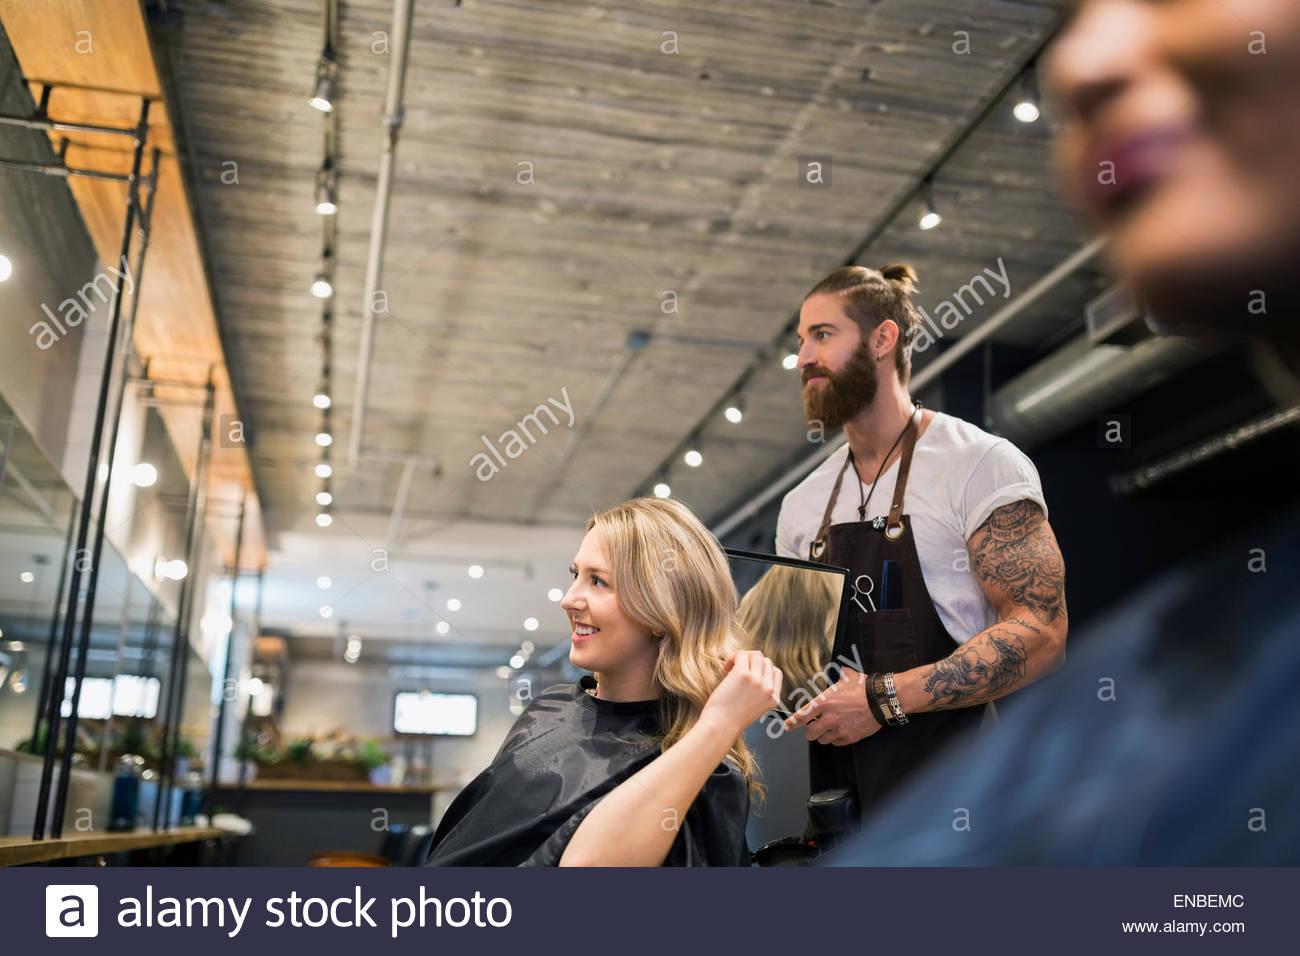 Frau Haar mit Spiegel Friseursalon Friseur Stockbild